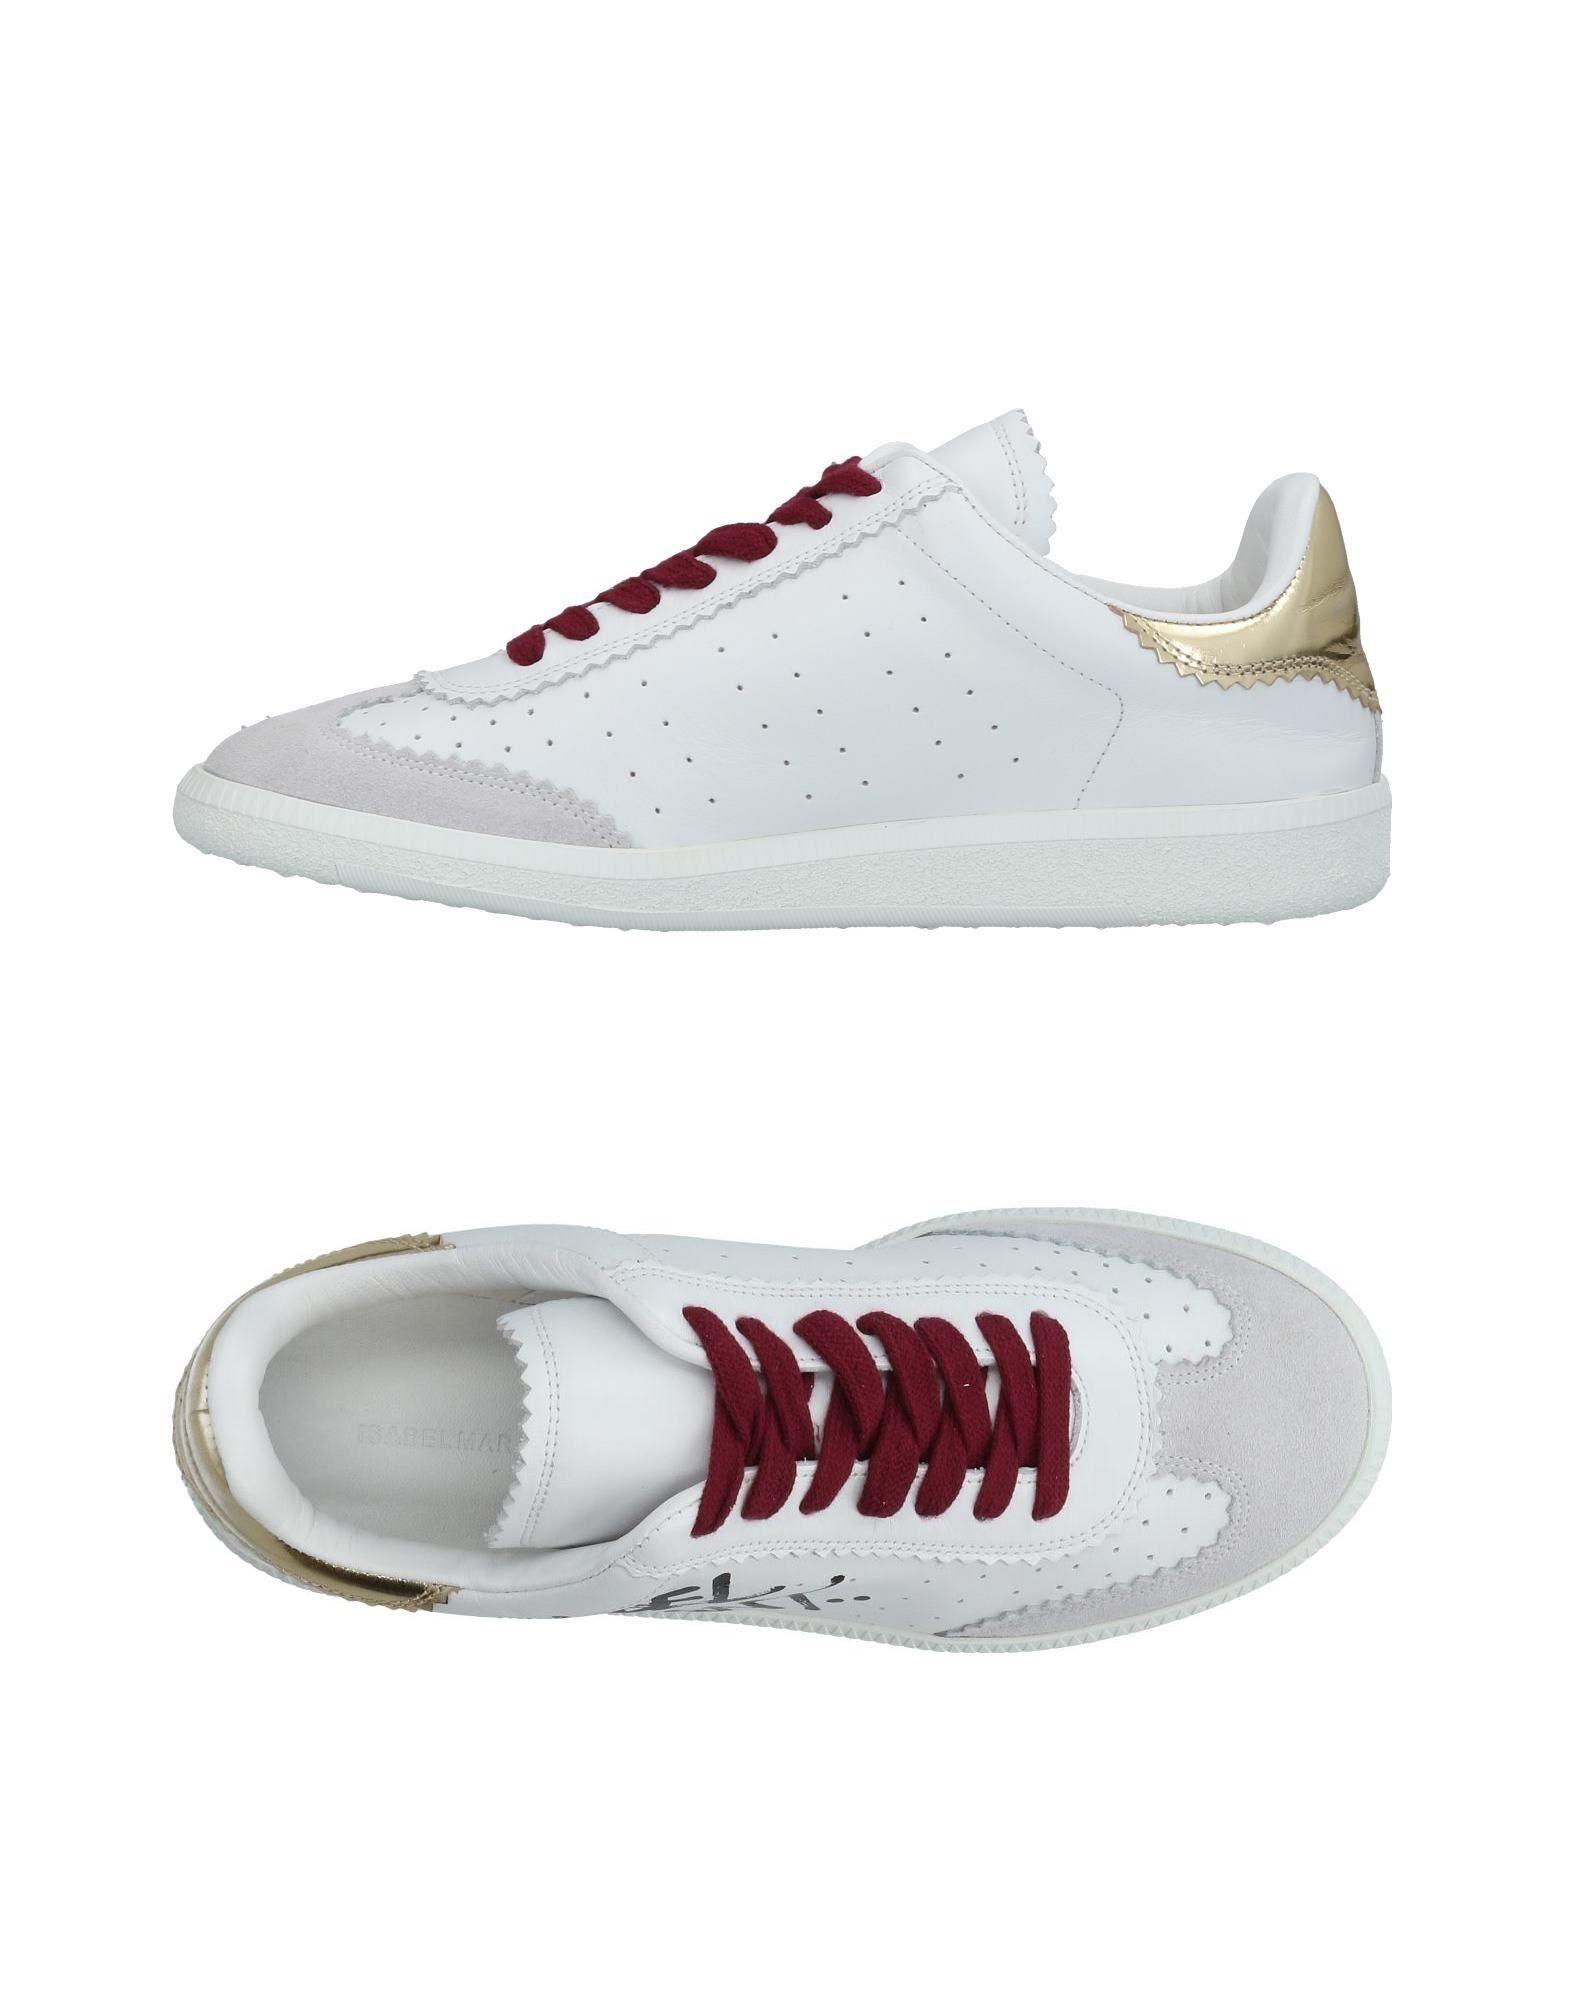 Rabatt Schuhe Isabel Marant Sneakers Damen  11449194TC